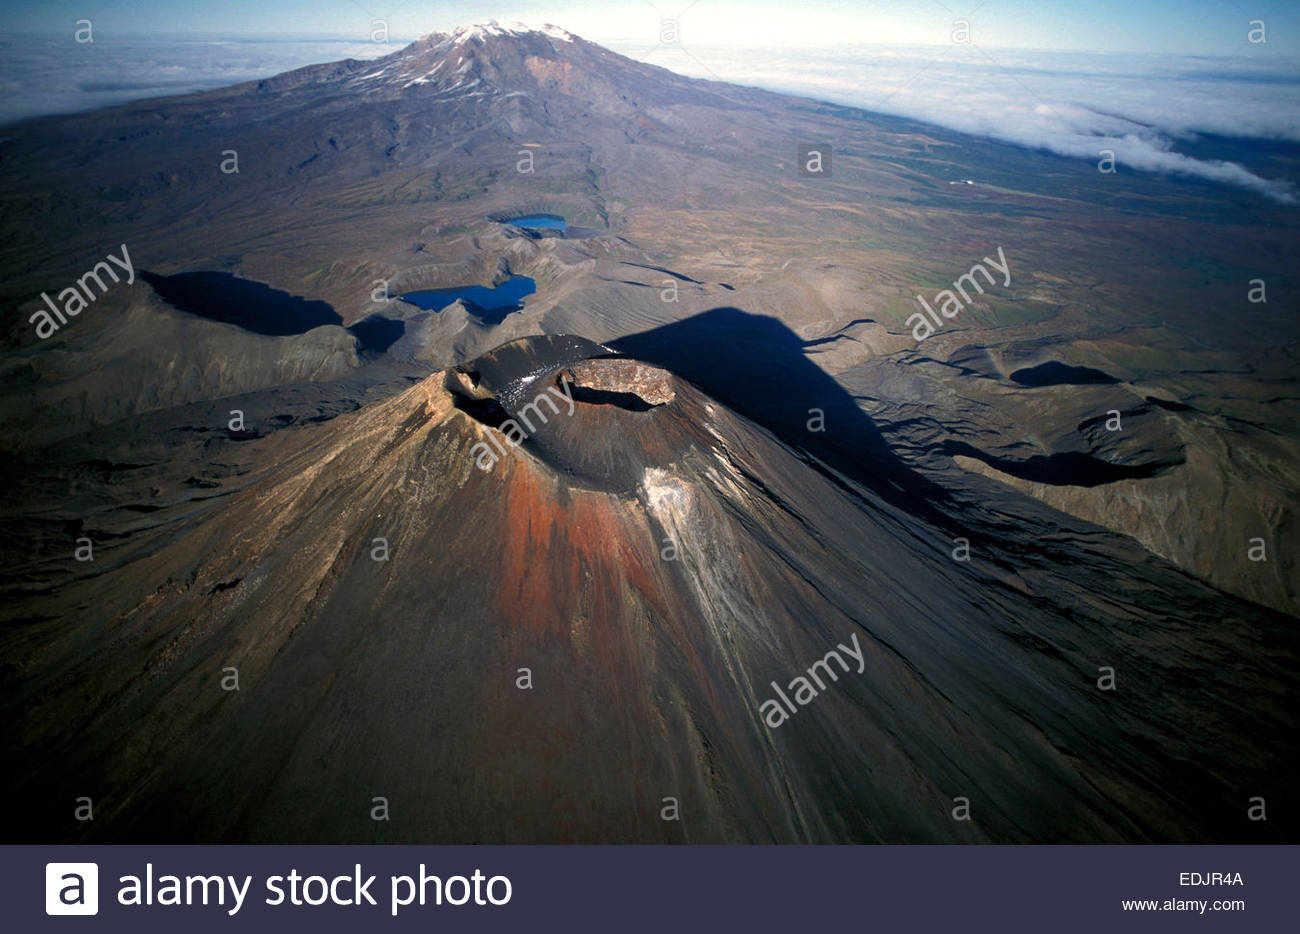 Ngauruhoe and Ruapehu volcanoes. Tongarori National Park, North island, New Zealand. - Stock Image